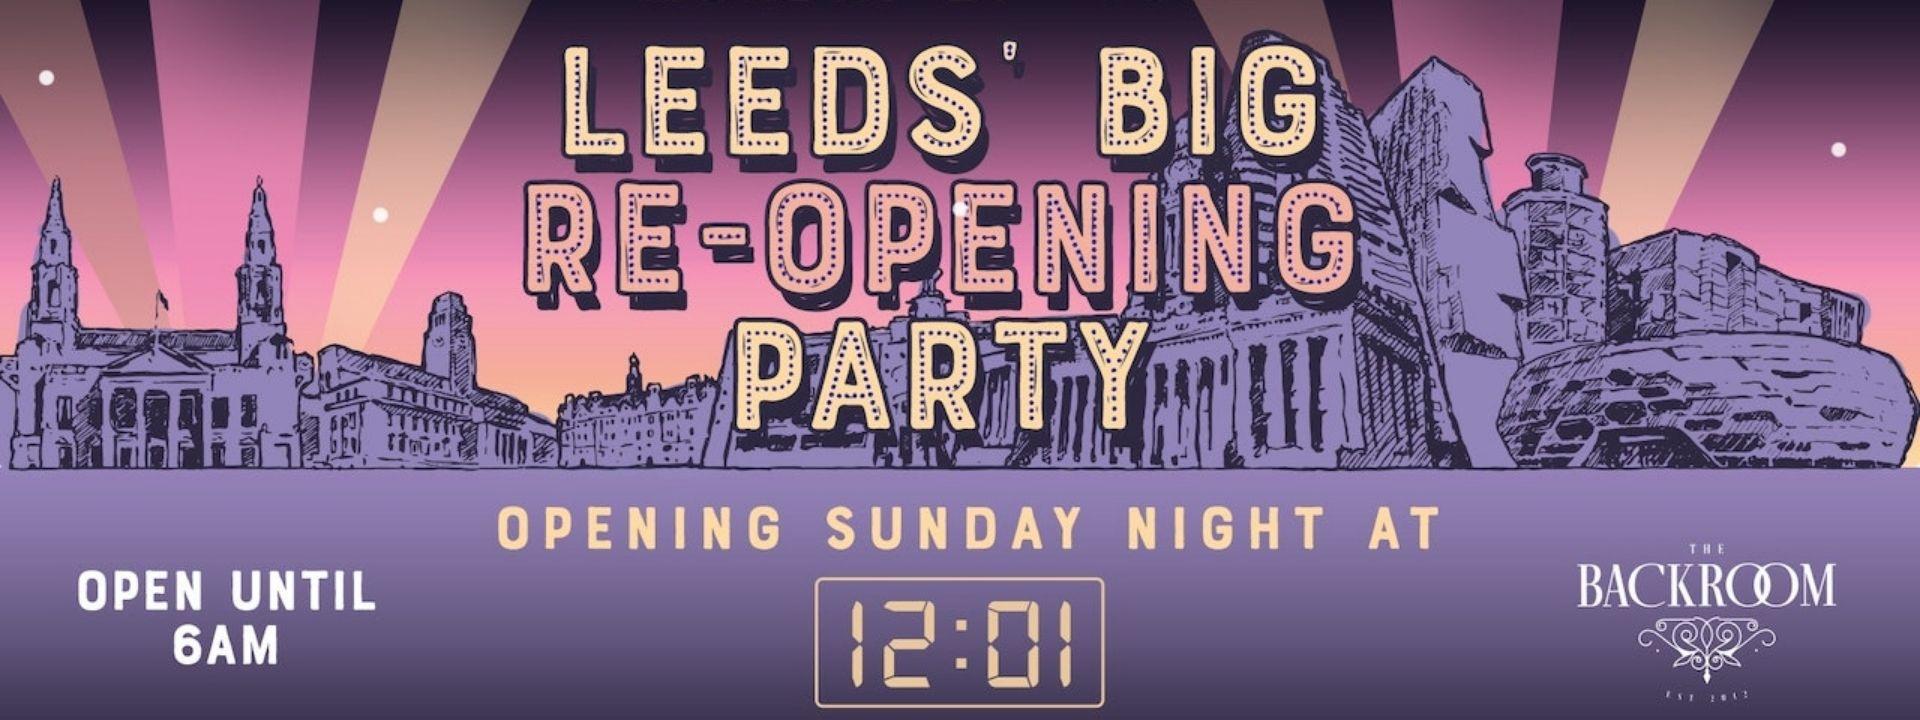 Leeds' Big Re-opening Party